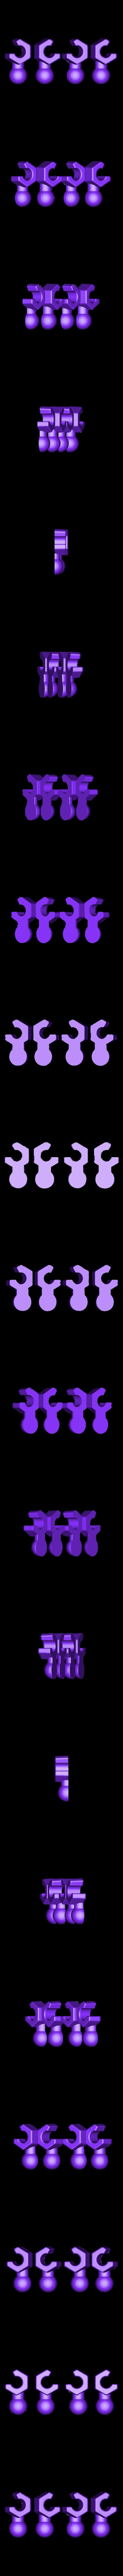 "modibot-remix-arms-hands-halves.stl Download free STL file Modibot action figure ""easy print"" remix • 3D printer design, firebird"